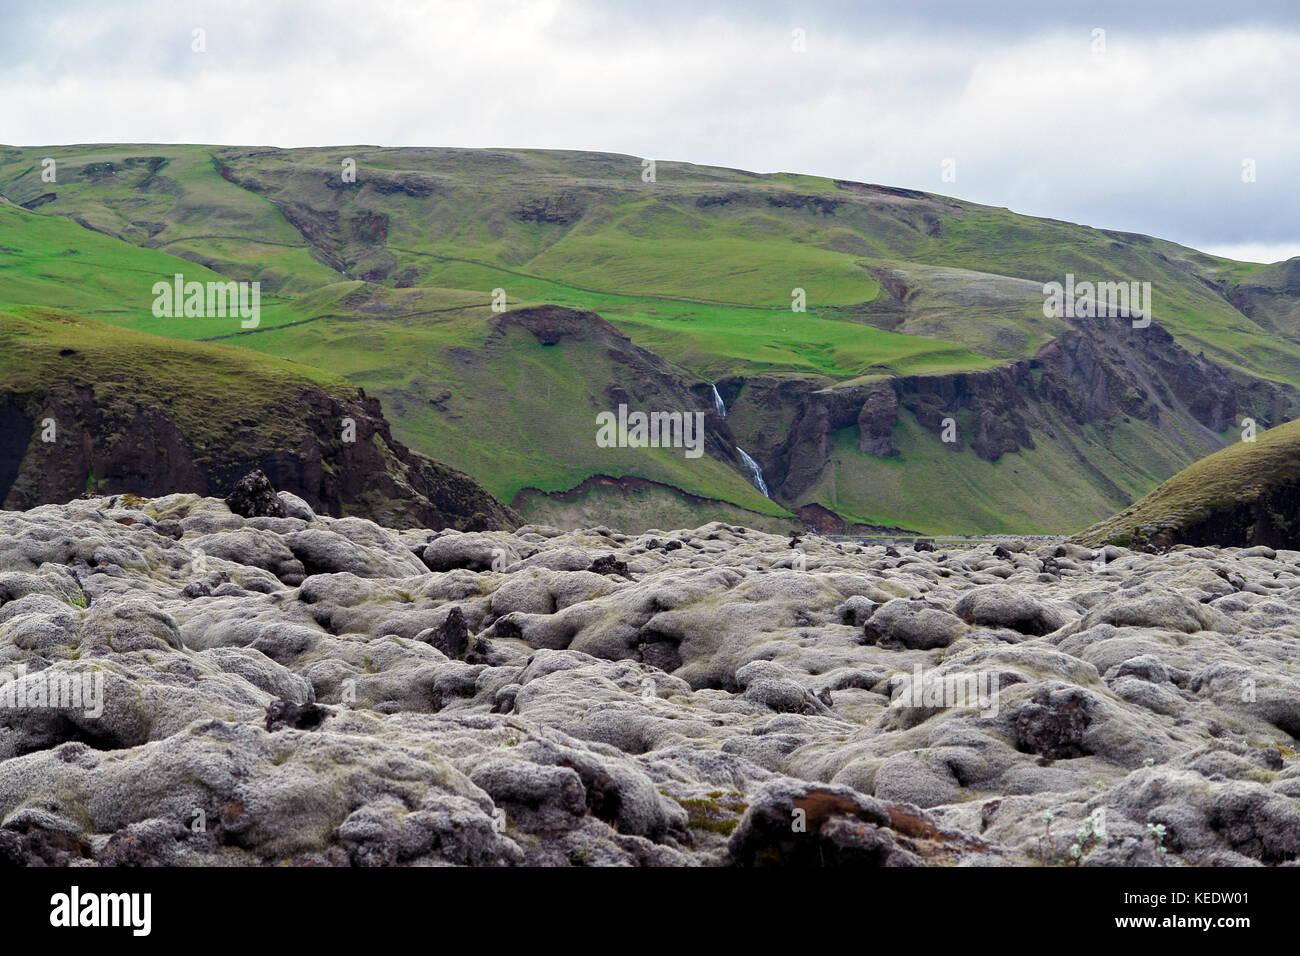 Eldhraun Lava Field - Southern Iceland - Stock Image